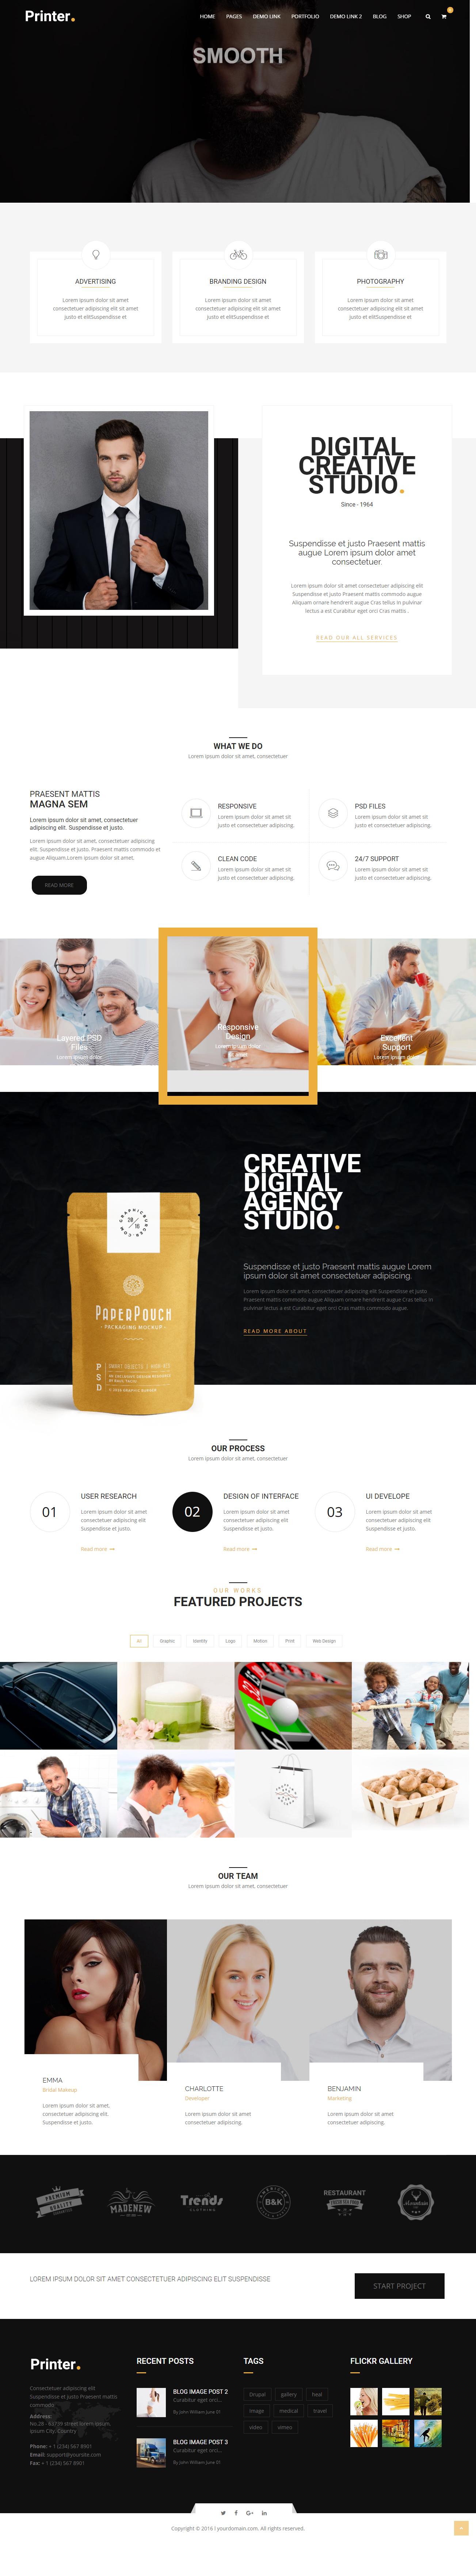 Printer - Responsive Multi-Purpose Drupal 8 7 Theme